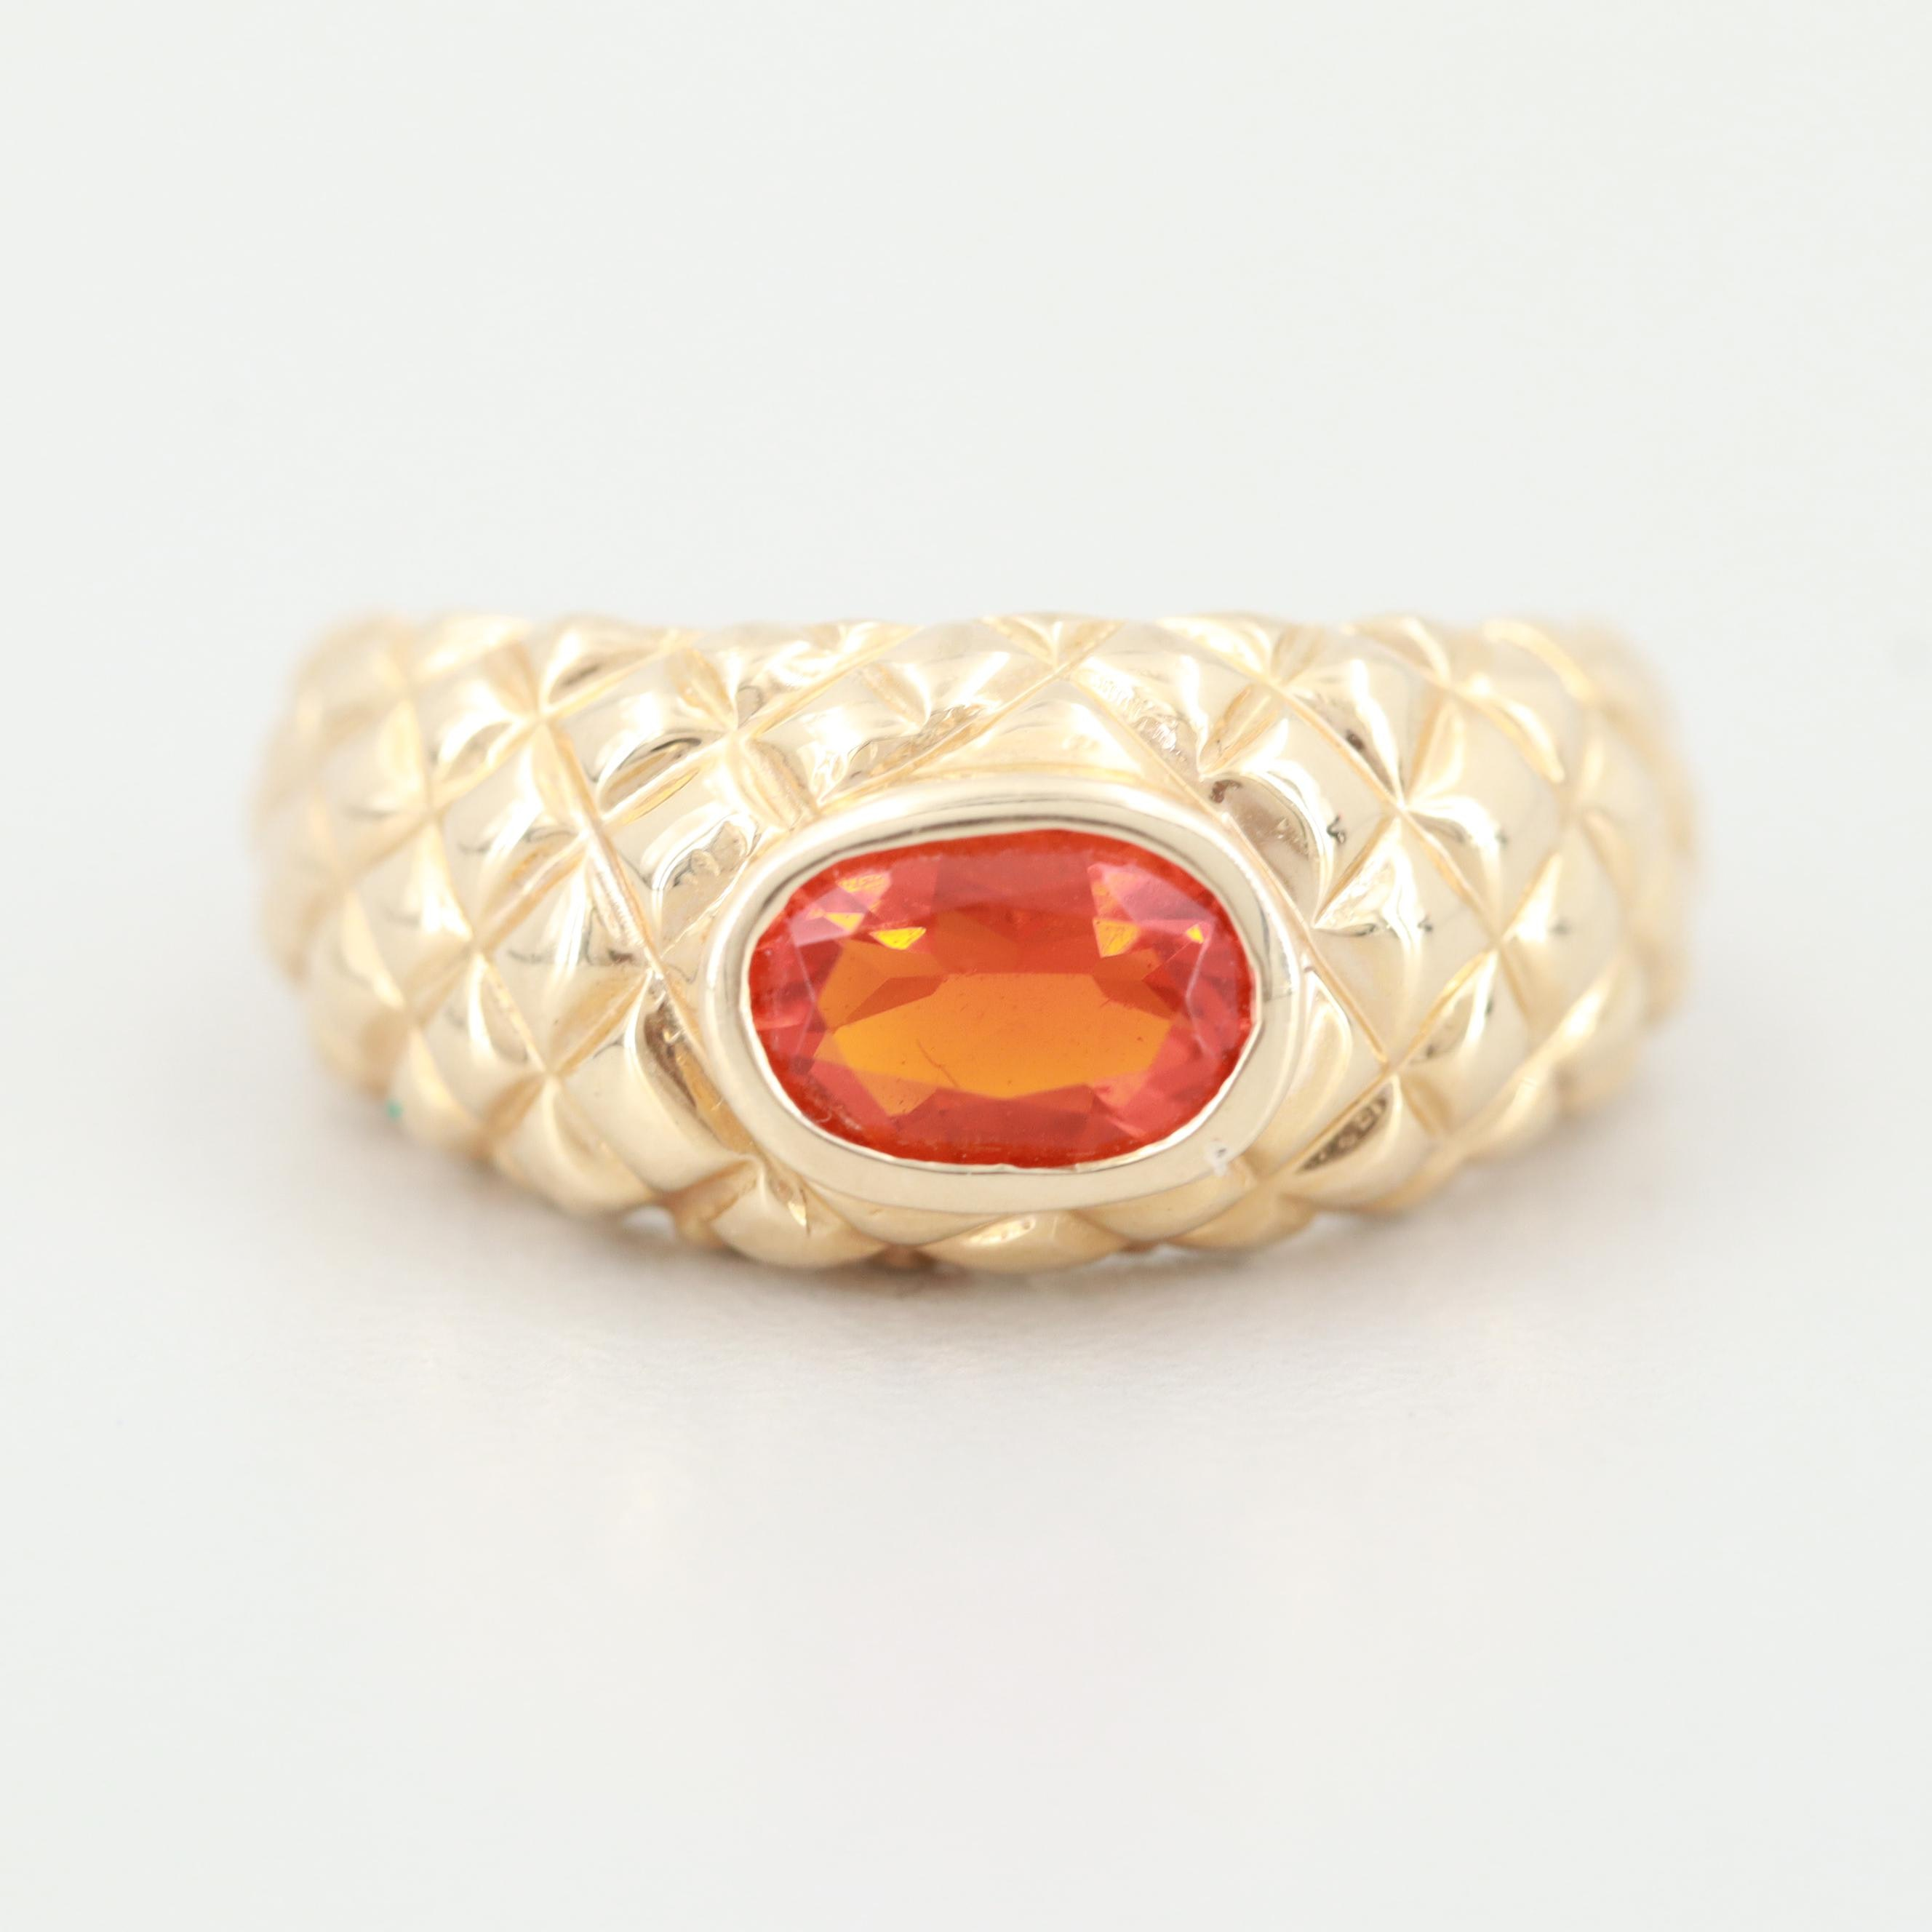 14K Yellow Gold Fire Opal Ring